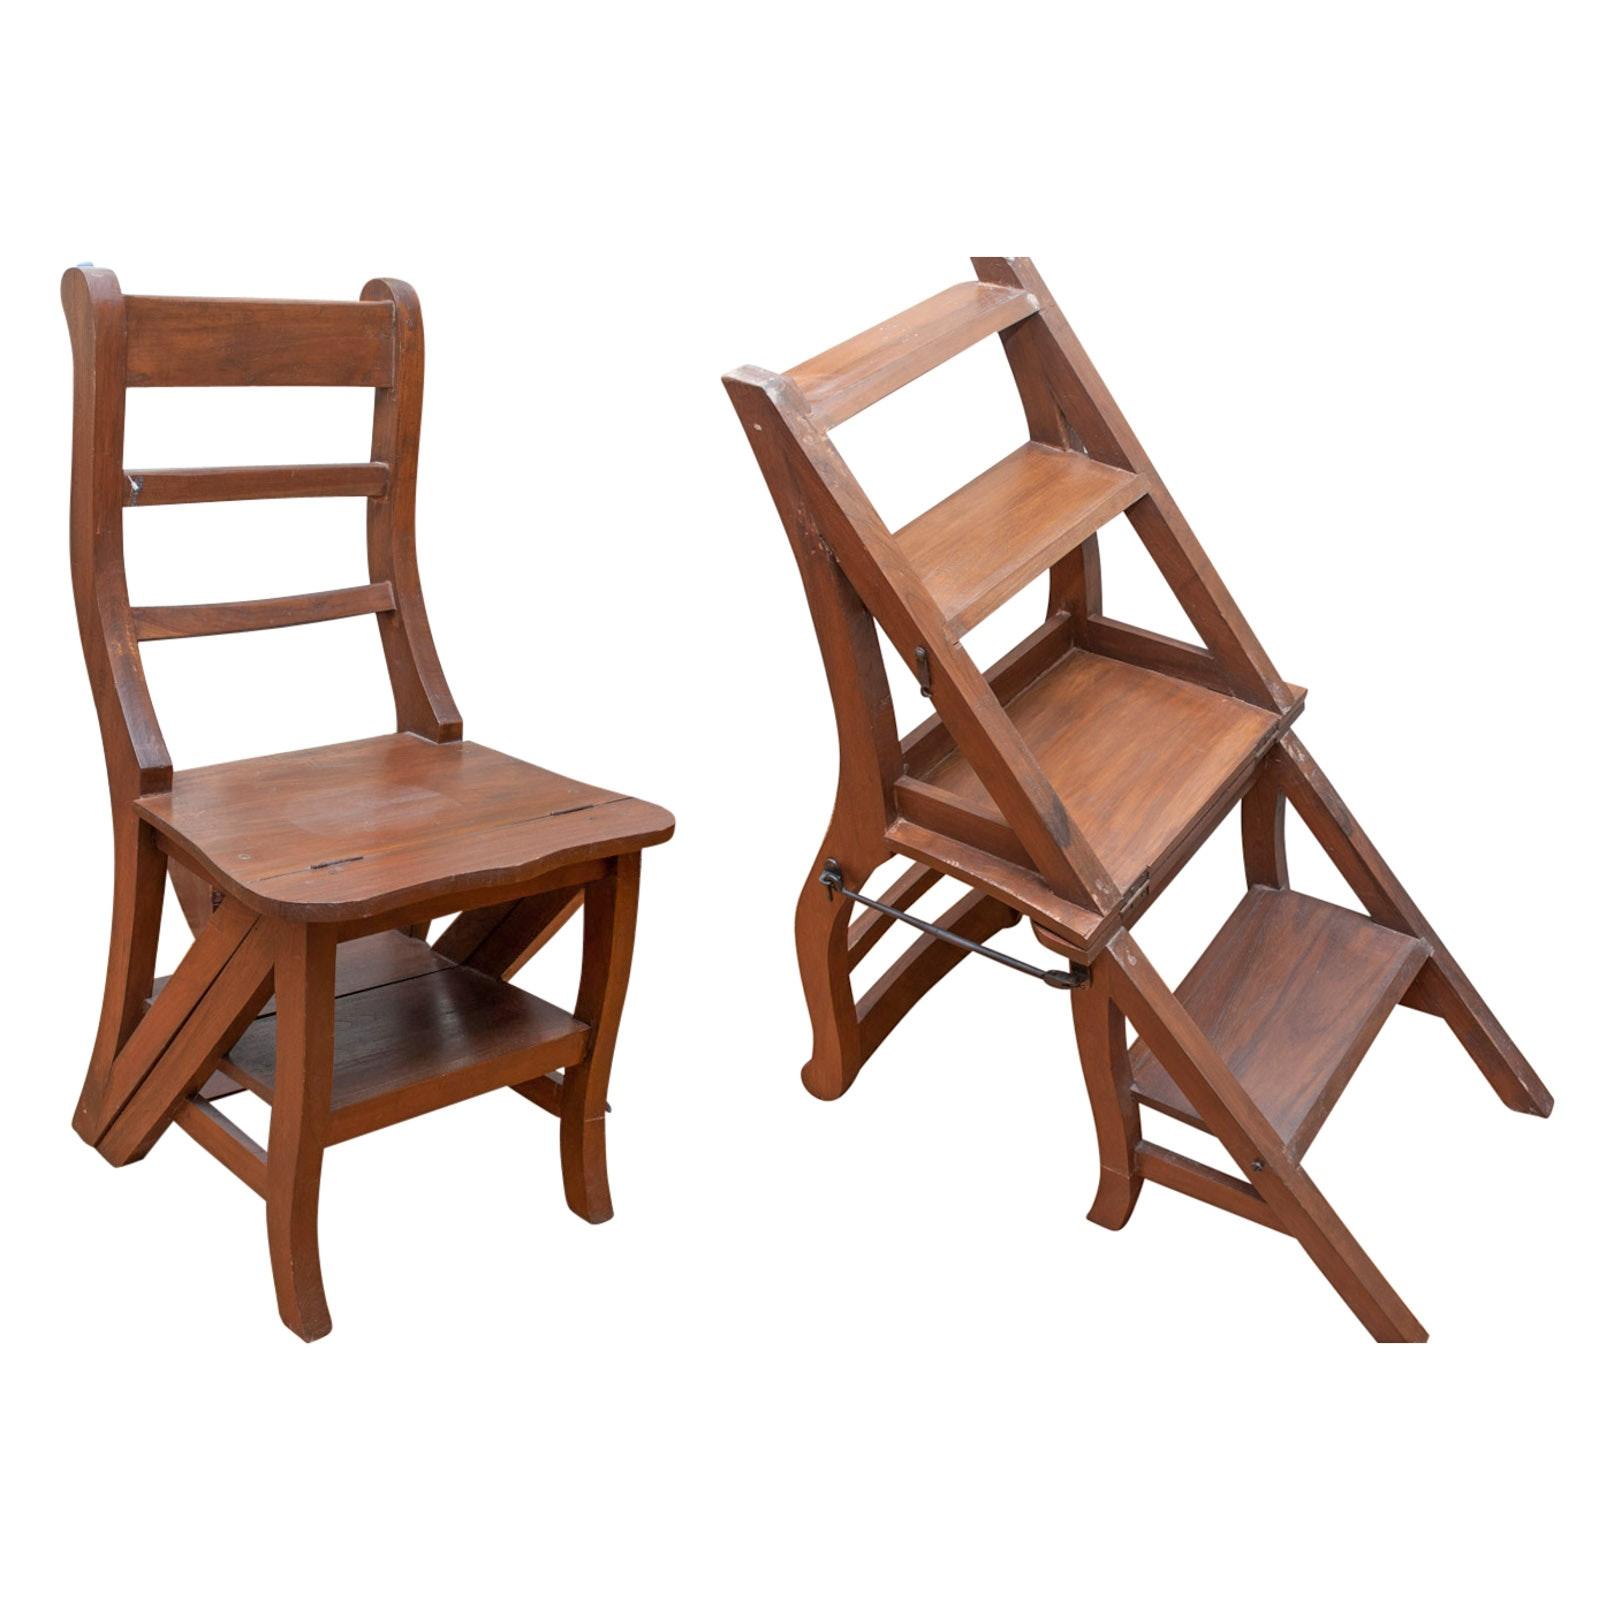 Vintage Franklin Chair / Step Stool ...  sc 1 st  Everything But The House & Vintage Franklin Chair / Step Stool : EBTH